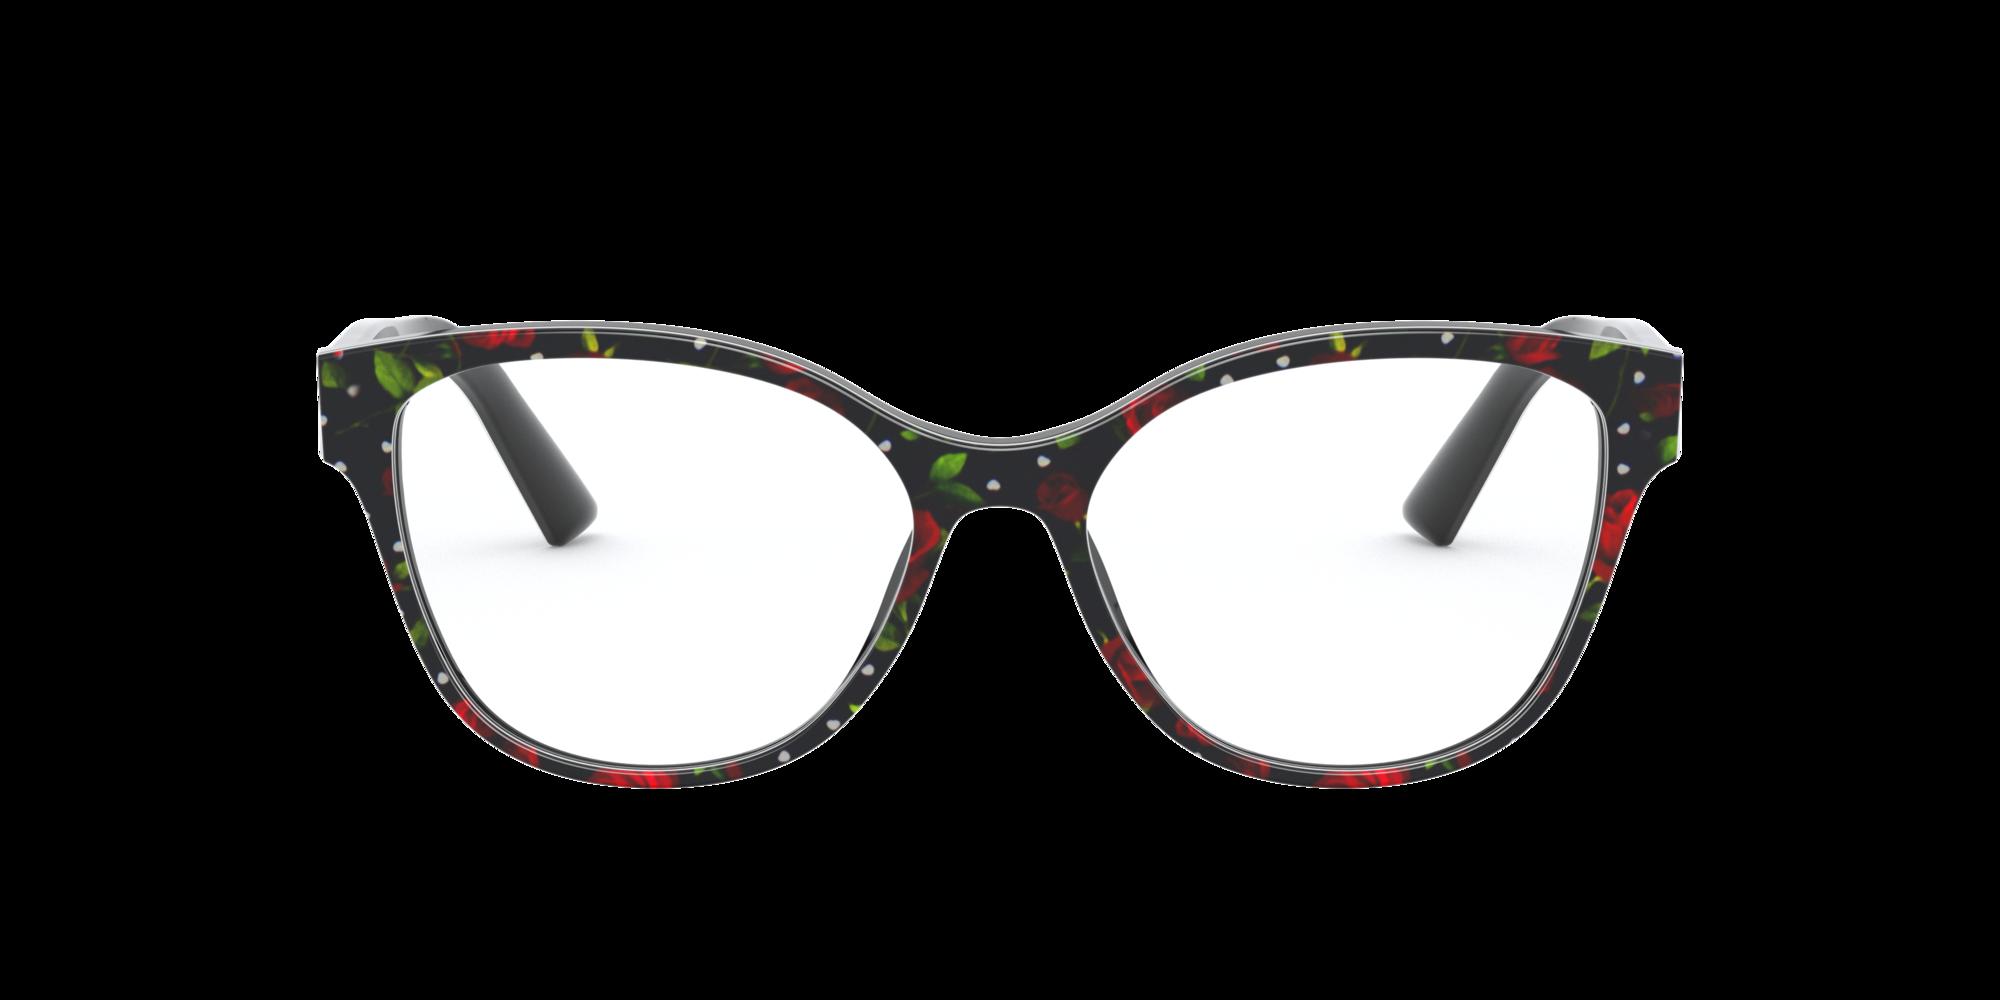 Image for DG3322 from LensCrafters | Glasses, Prescription Glasses Online, Eyewear